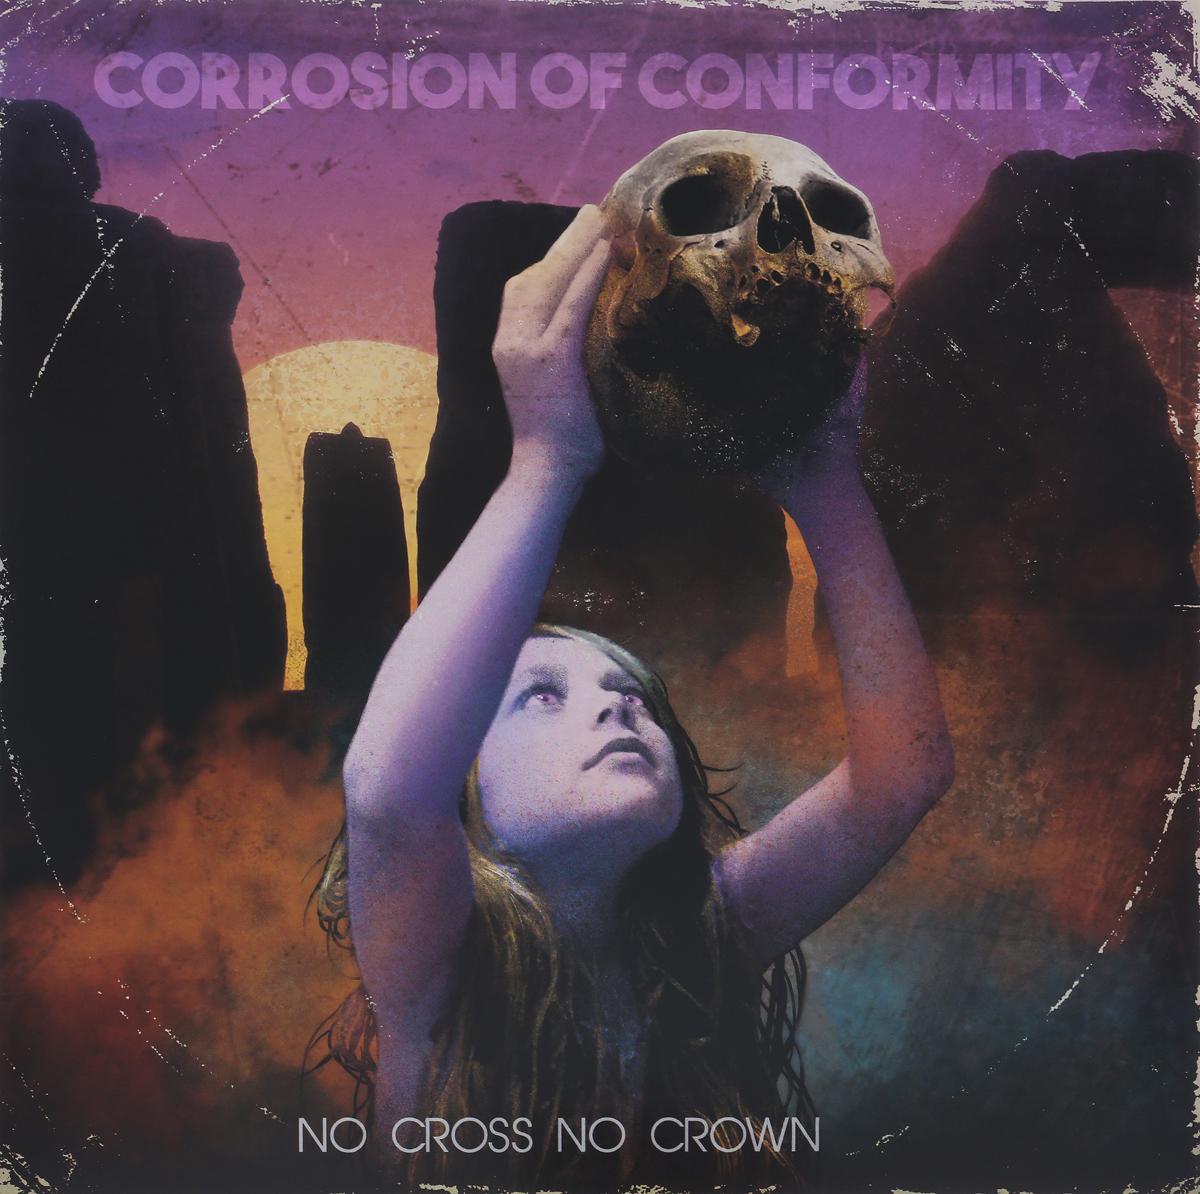 COC Corrosion of Conformity. No Cross No Crown (2 LP) svart crown svart crown abreaction lp cd